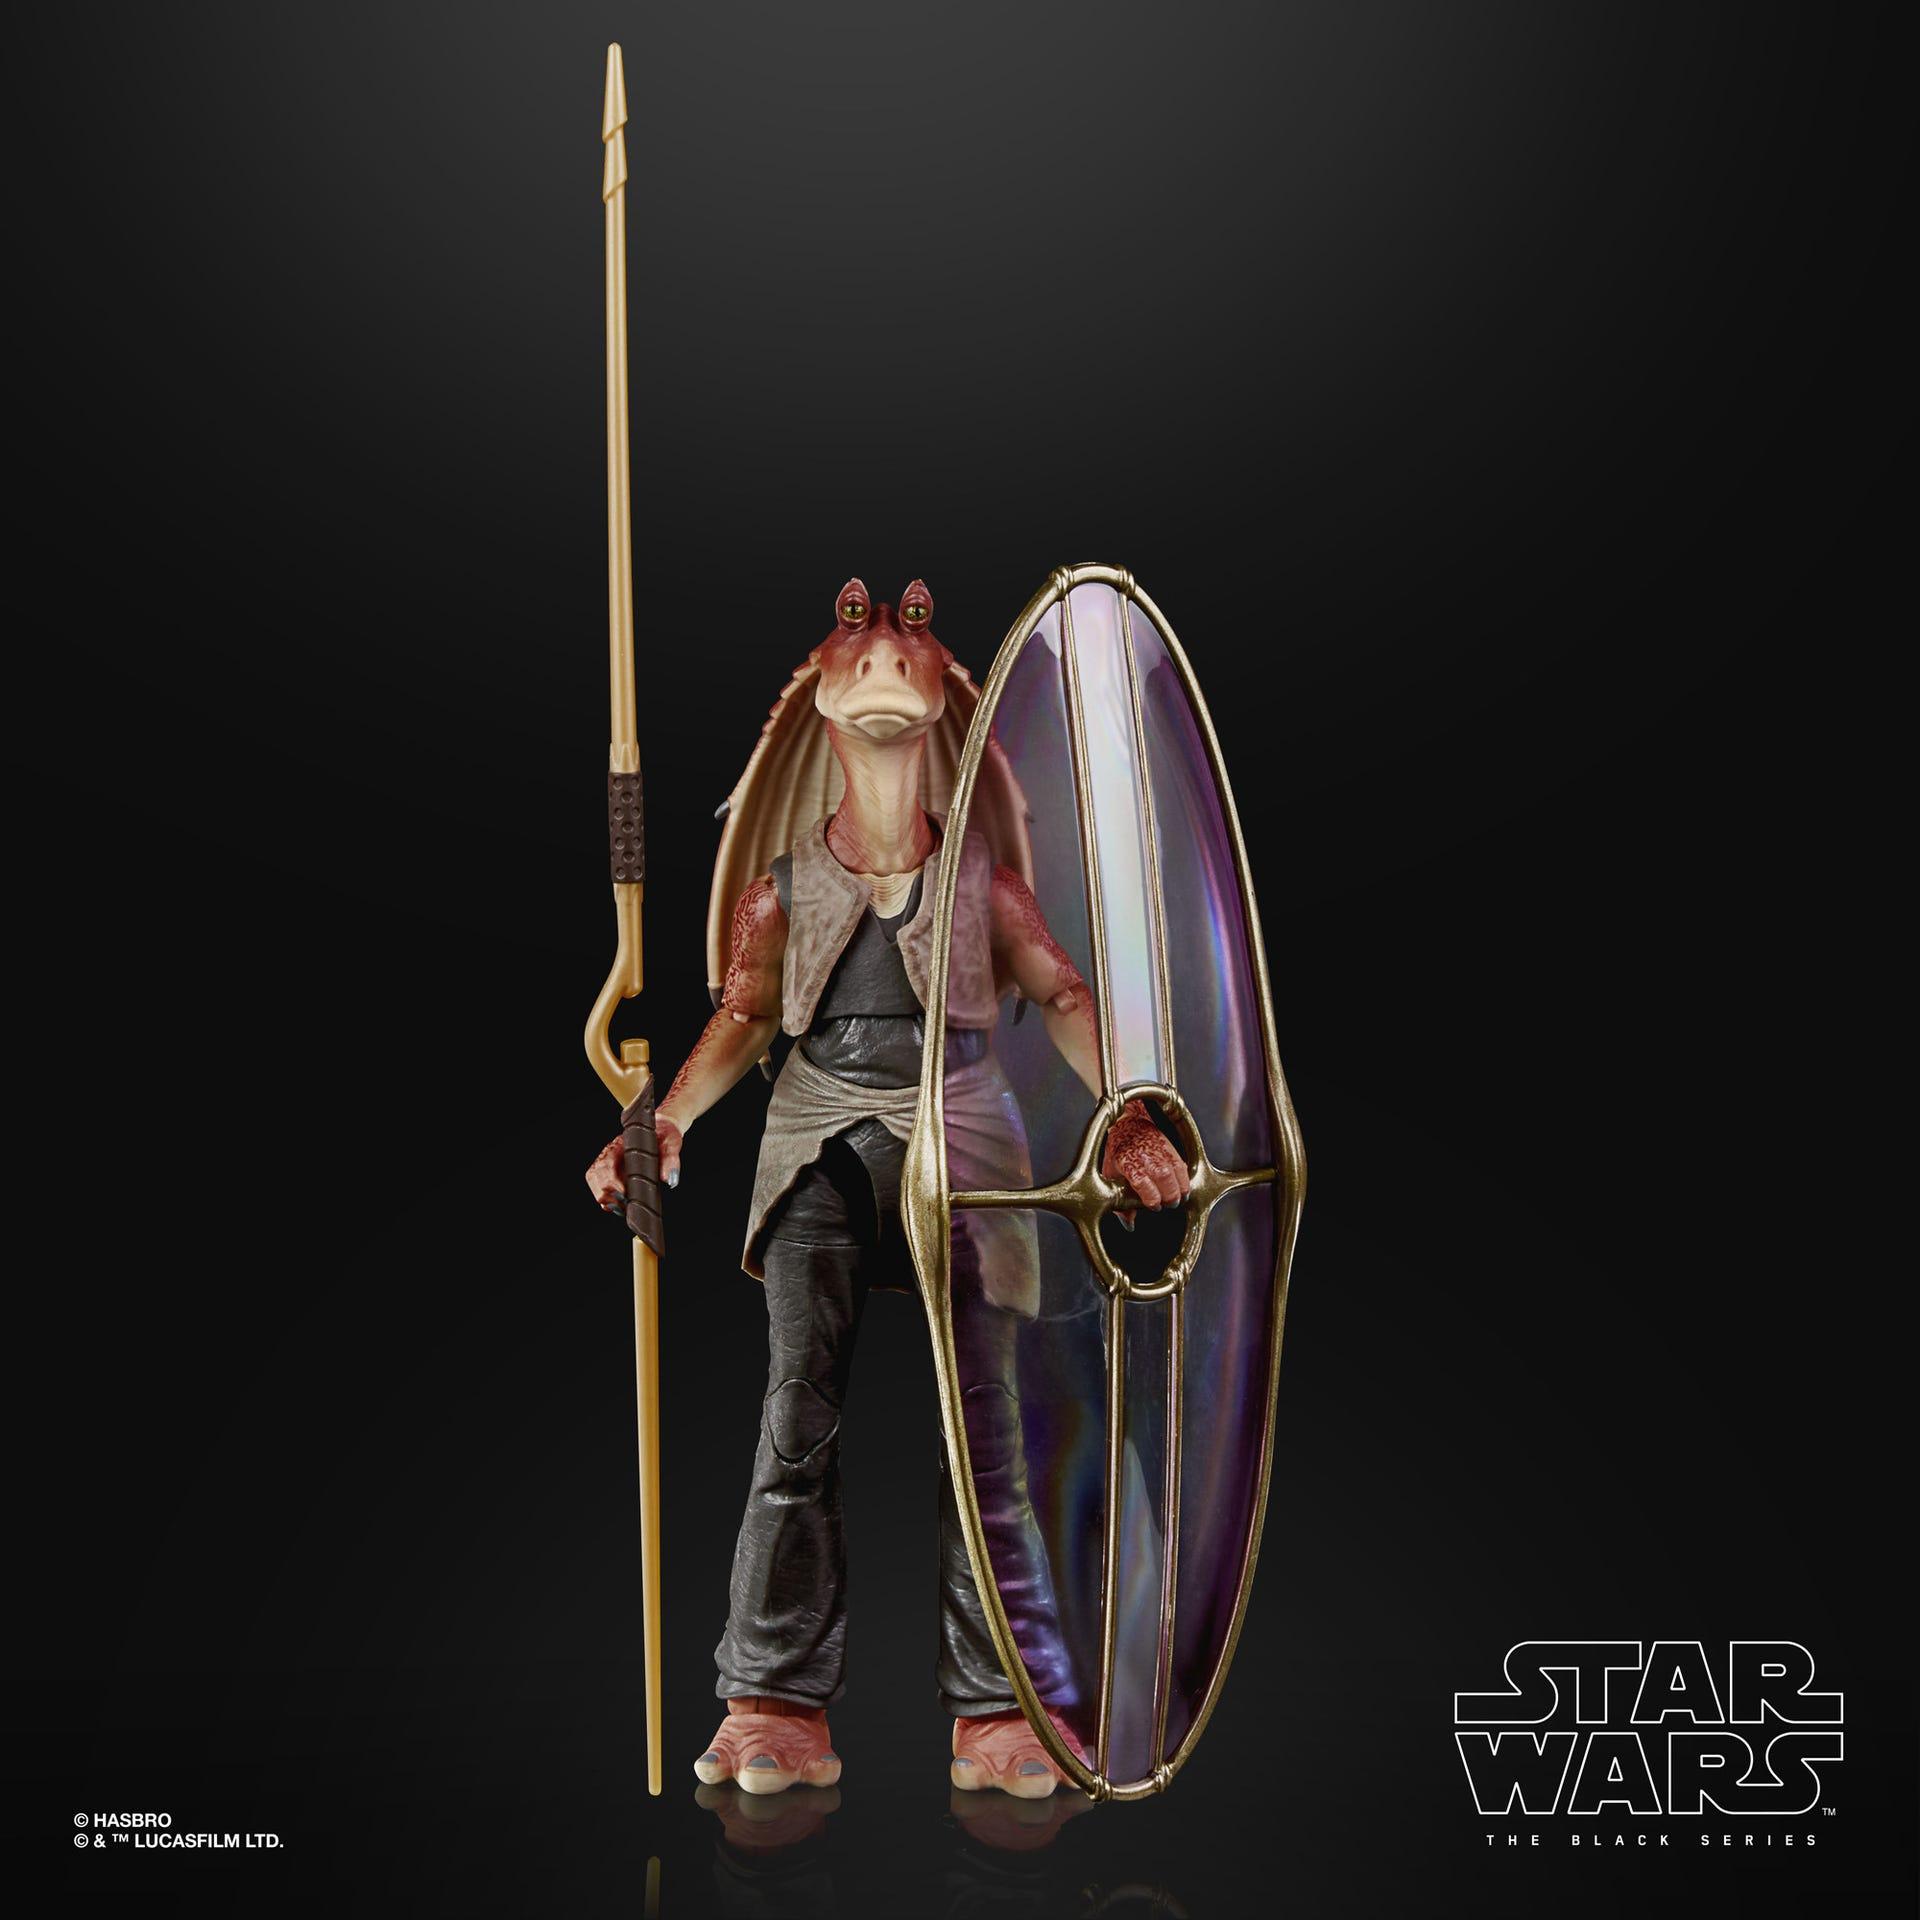 Star Wars The Black Series Jar Jar Binks Deluxe Figur 15 cm F0490 5010993782680